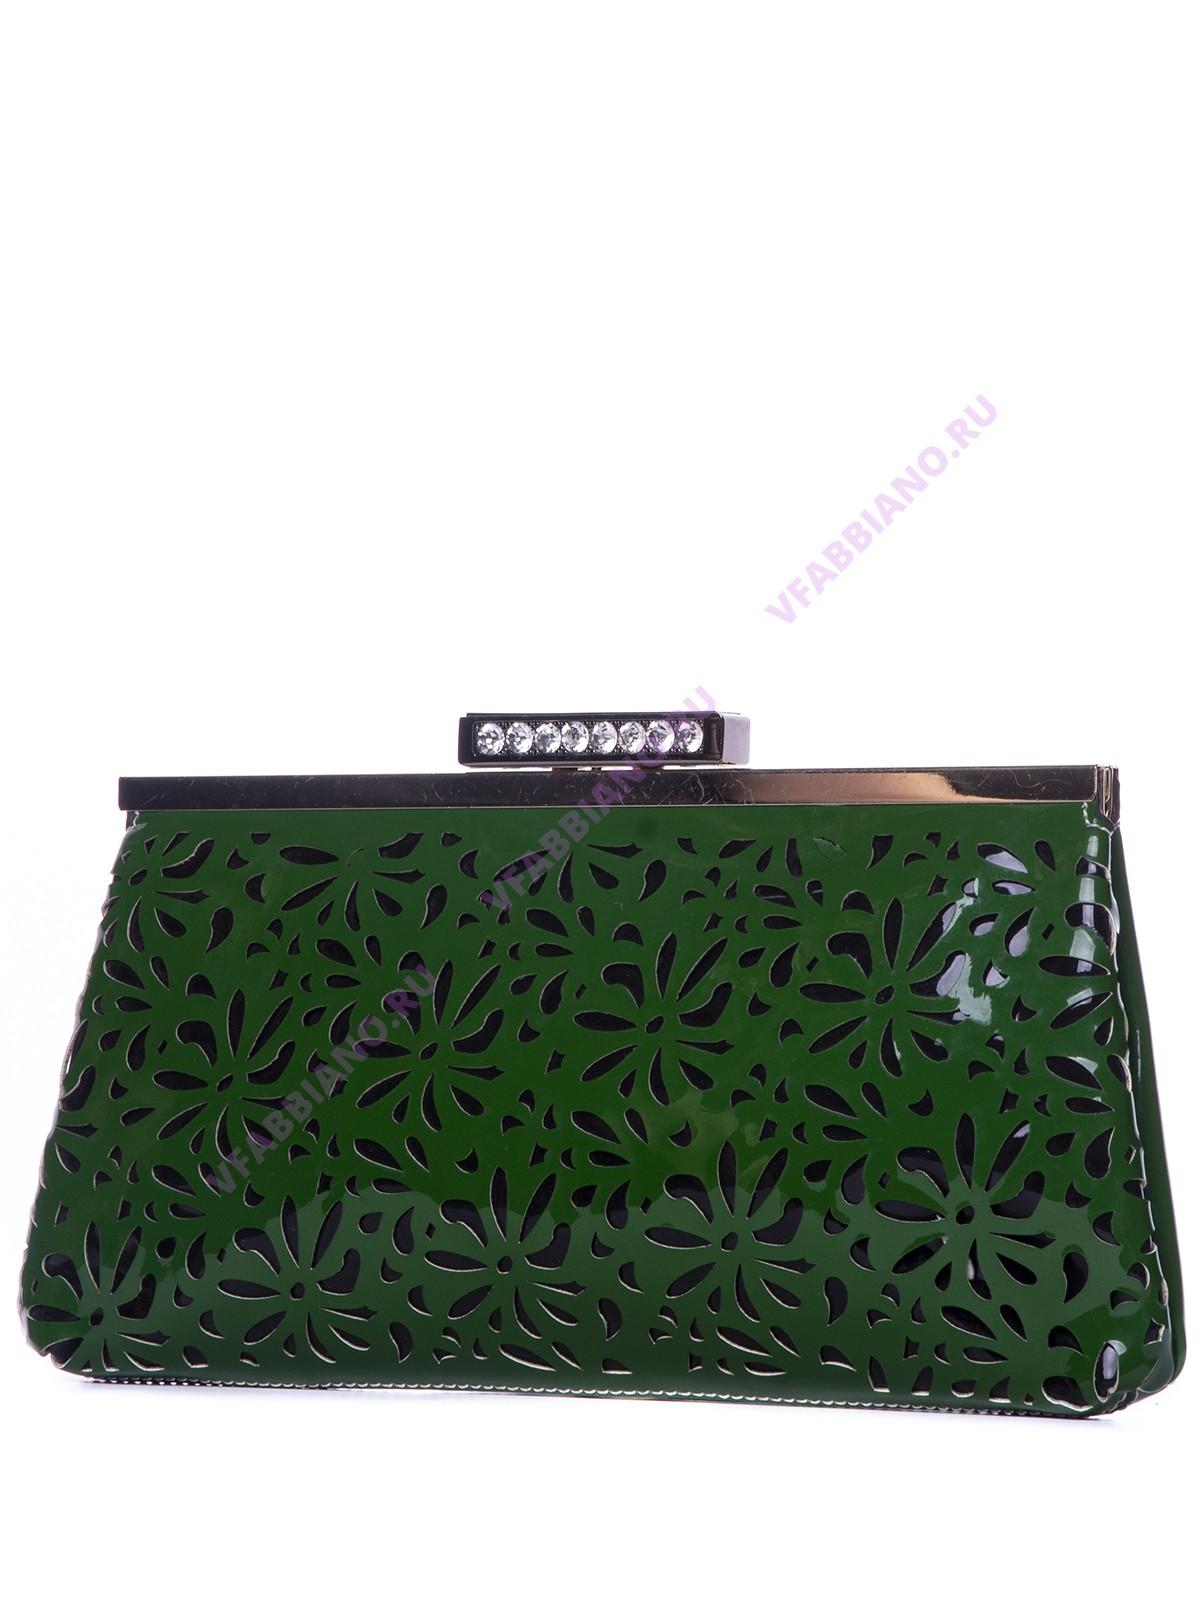 Кросс-боди 57169 2yb-green